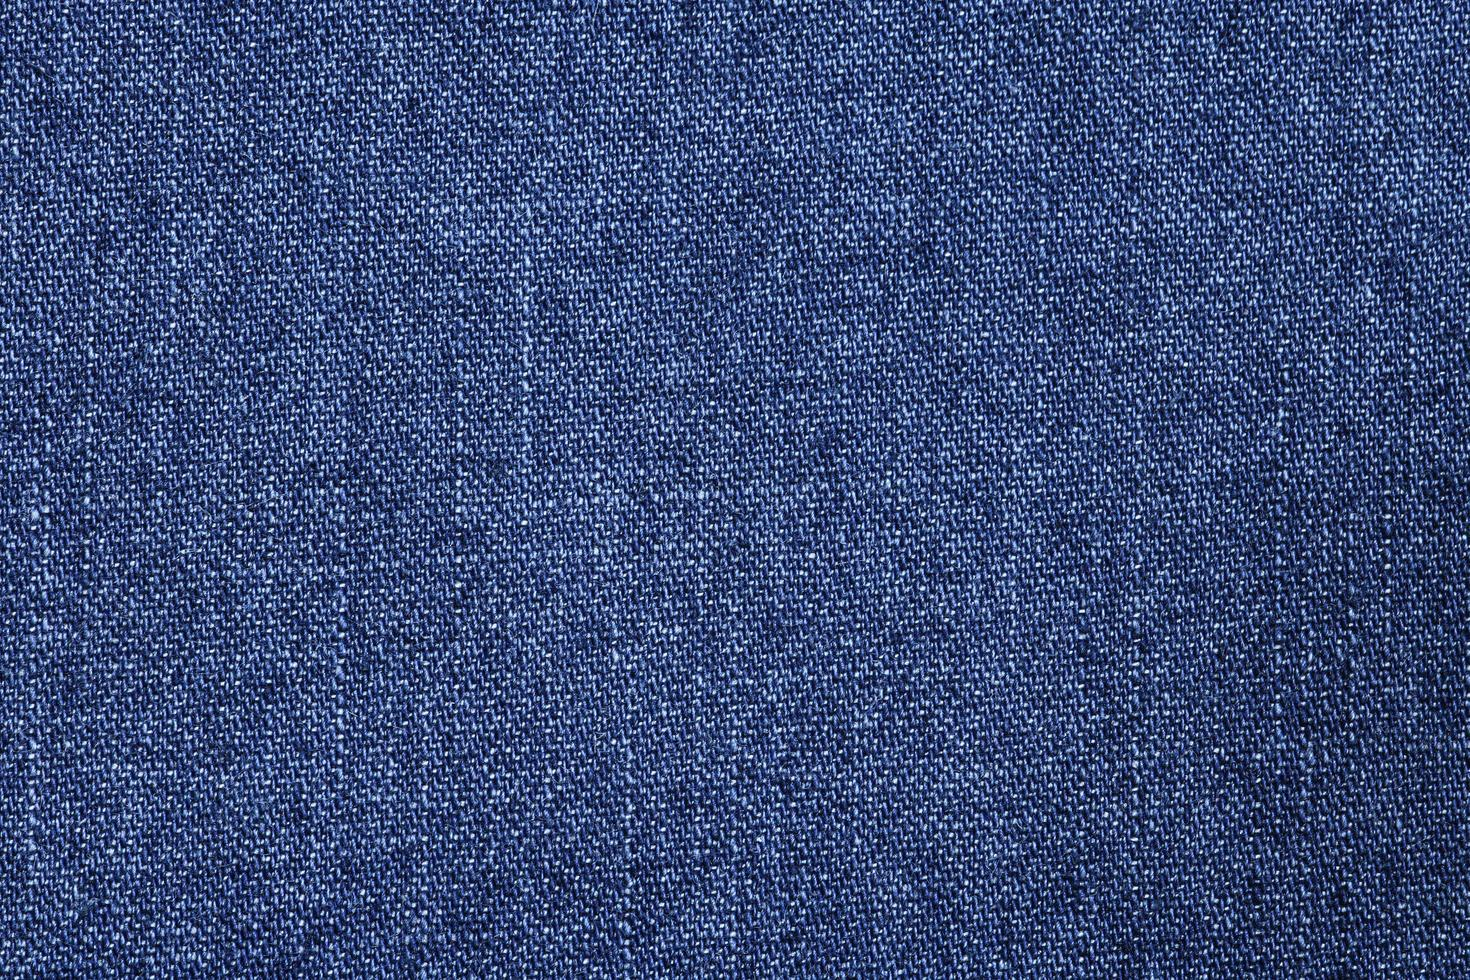 Close-up of blue denim photo